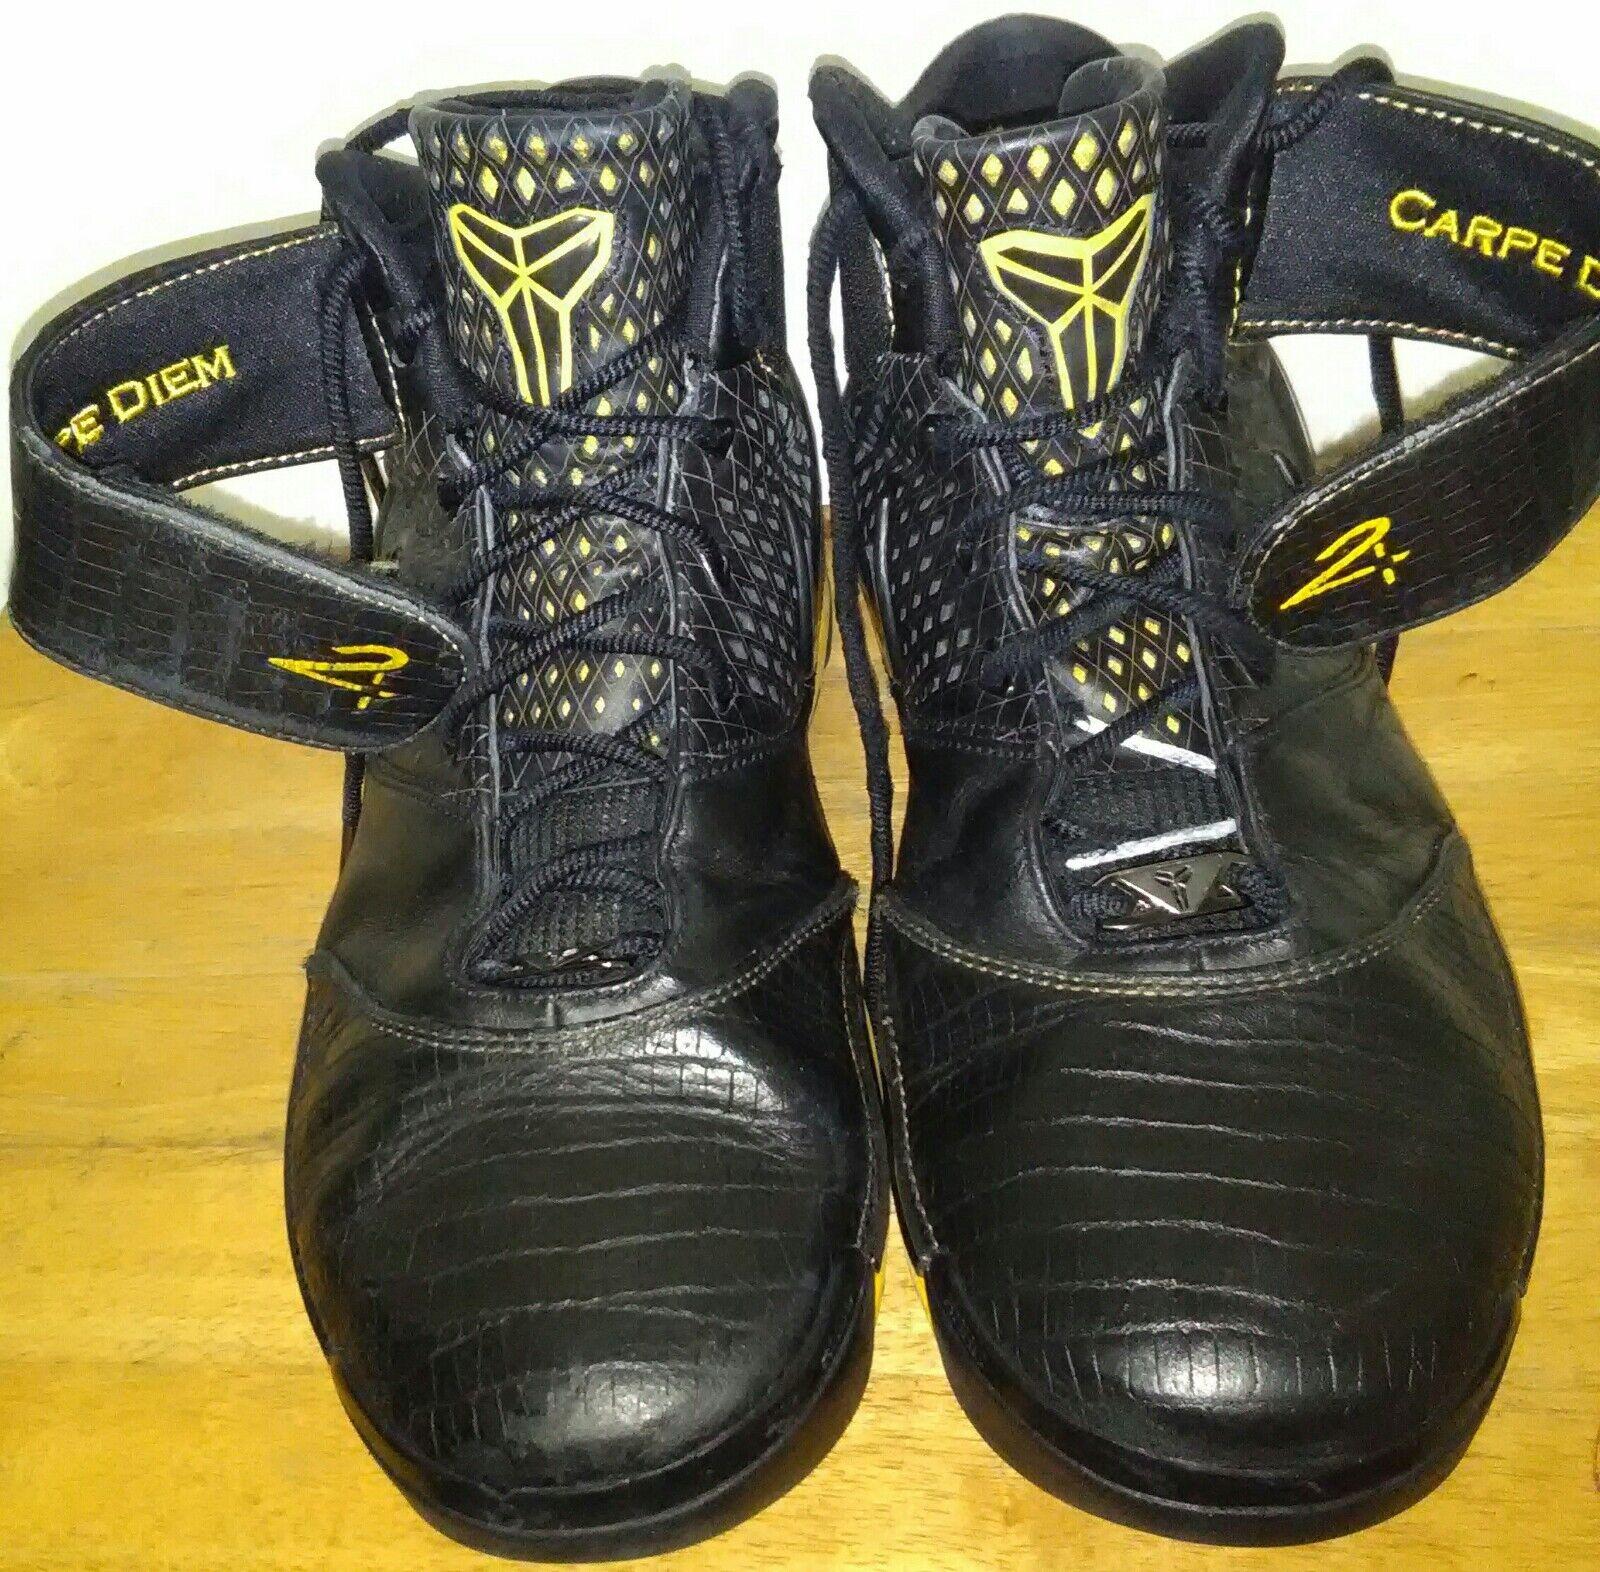 2007 Nike Zoom Kobe II 2 Carpe Diem Maize Yellow Black 316022-001 OG. Size 15